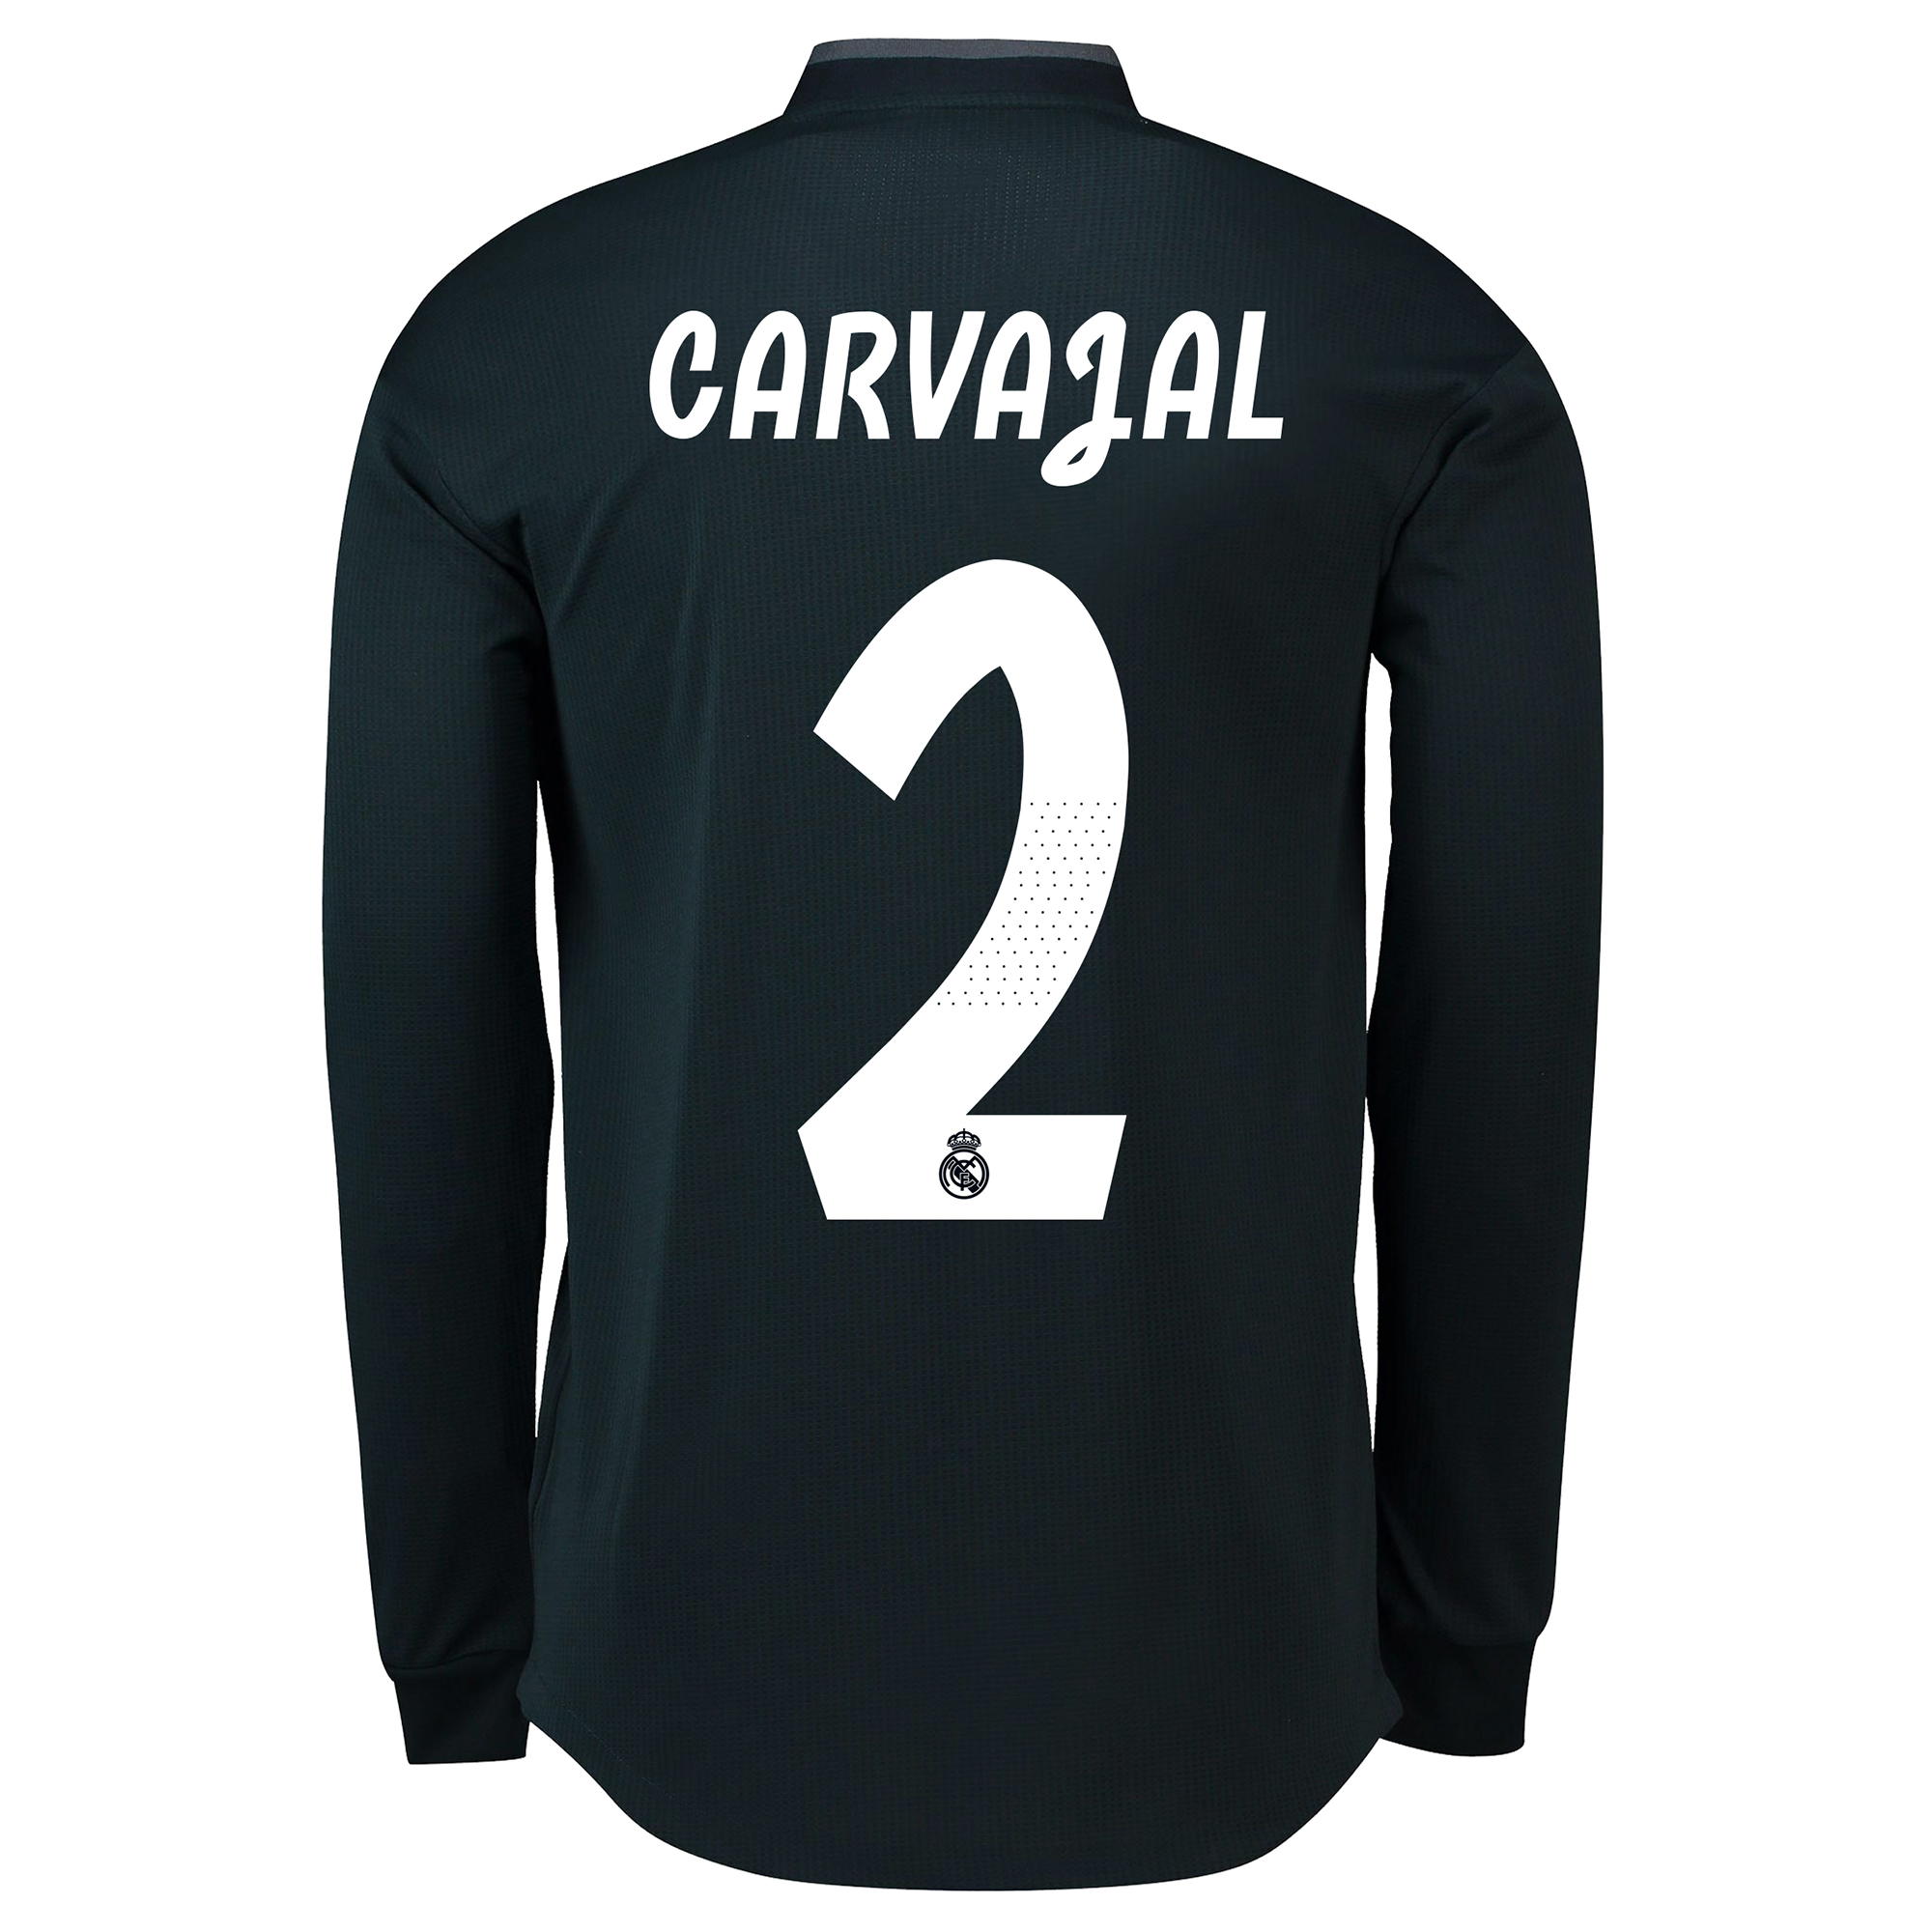 Image of Real Madrid Away Adi Zero Shirt 2018-19 - Long Sleeve with Carvajal 2 printing